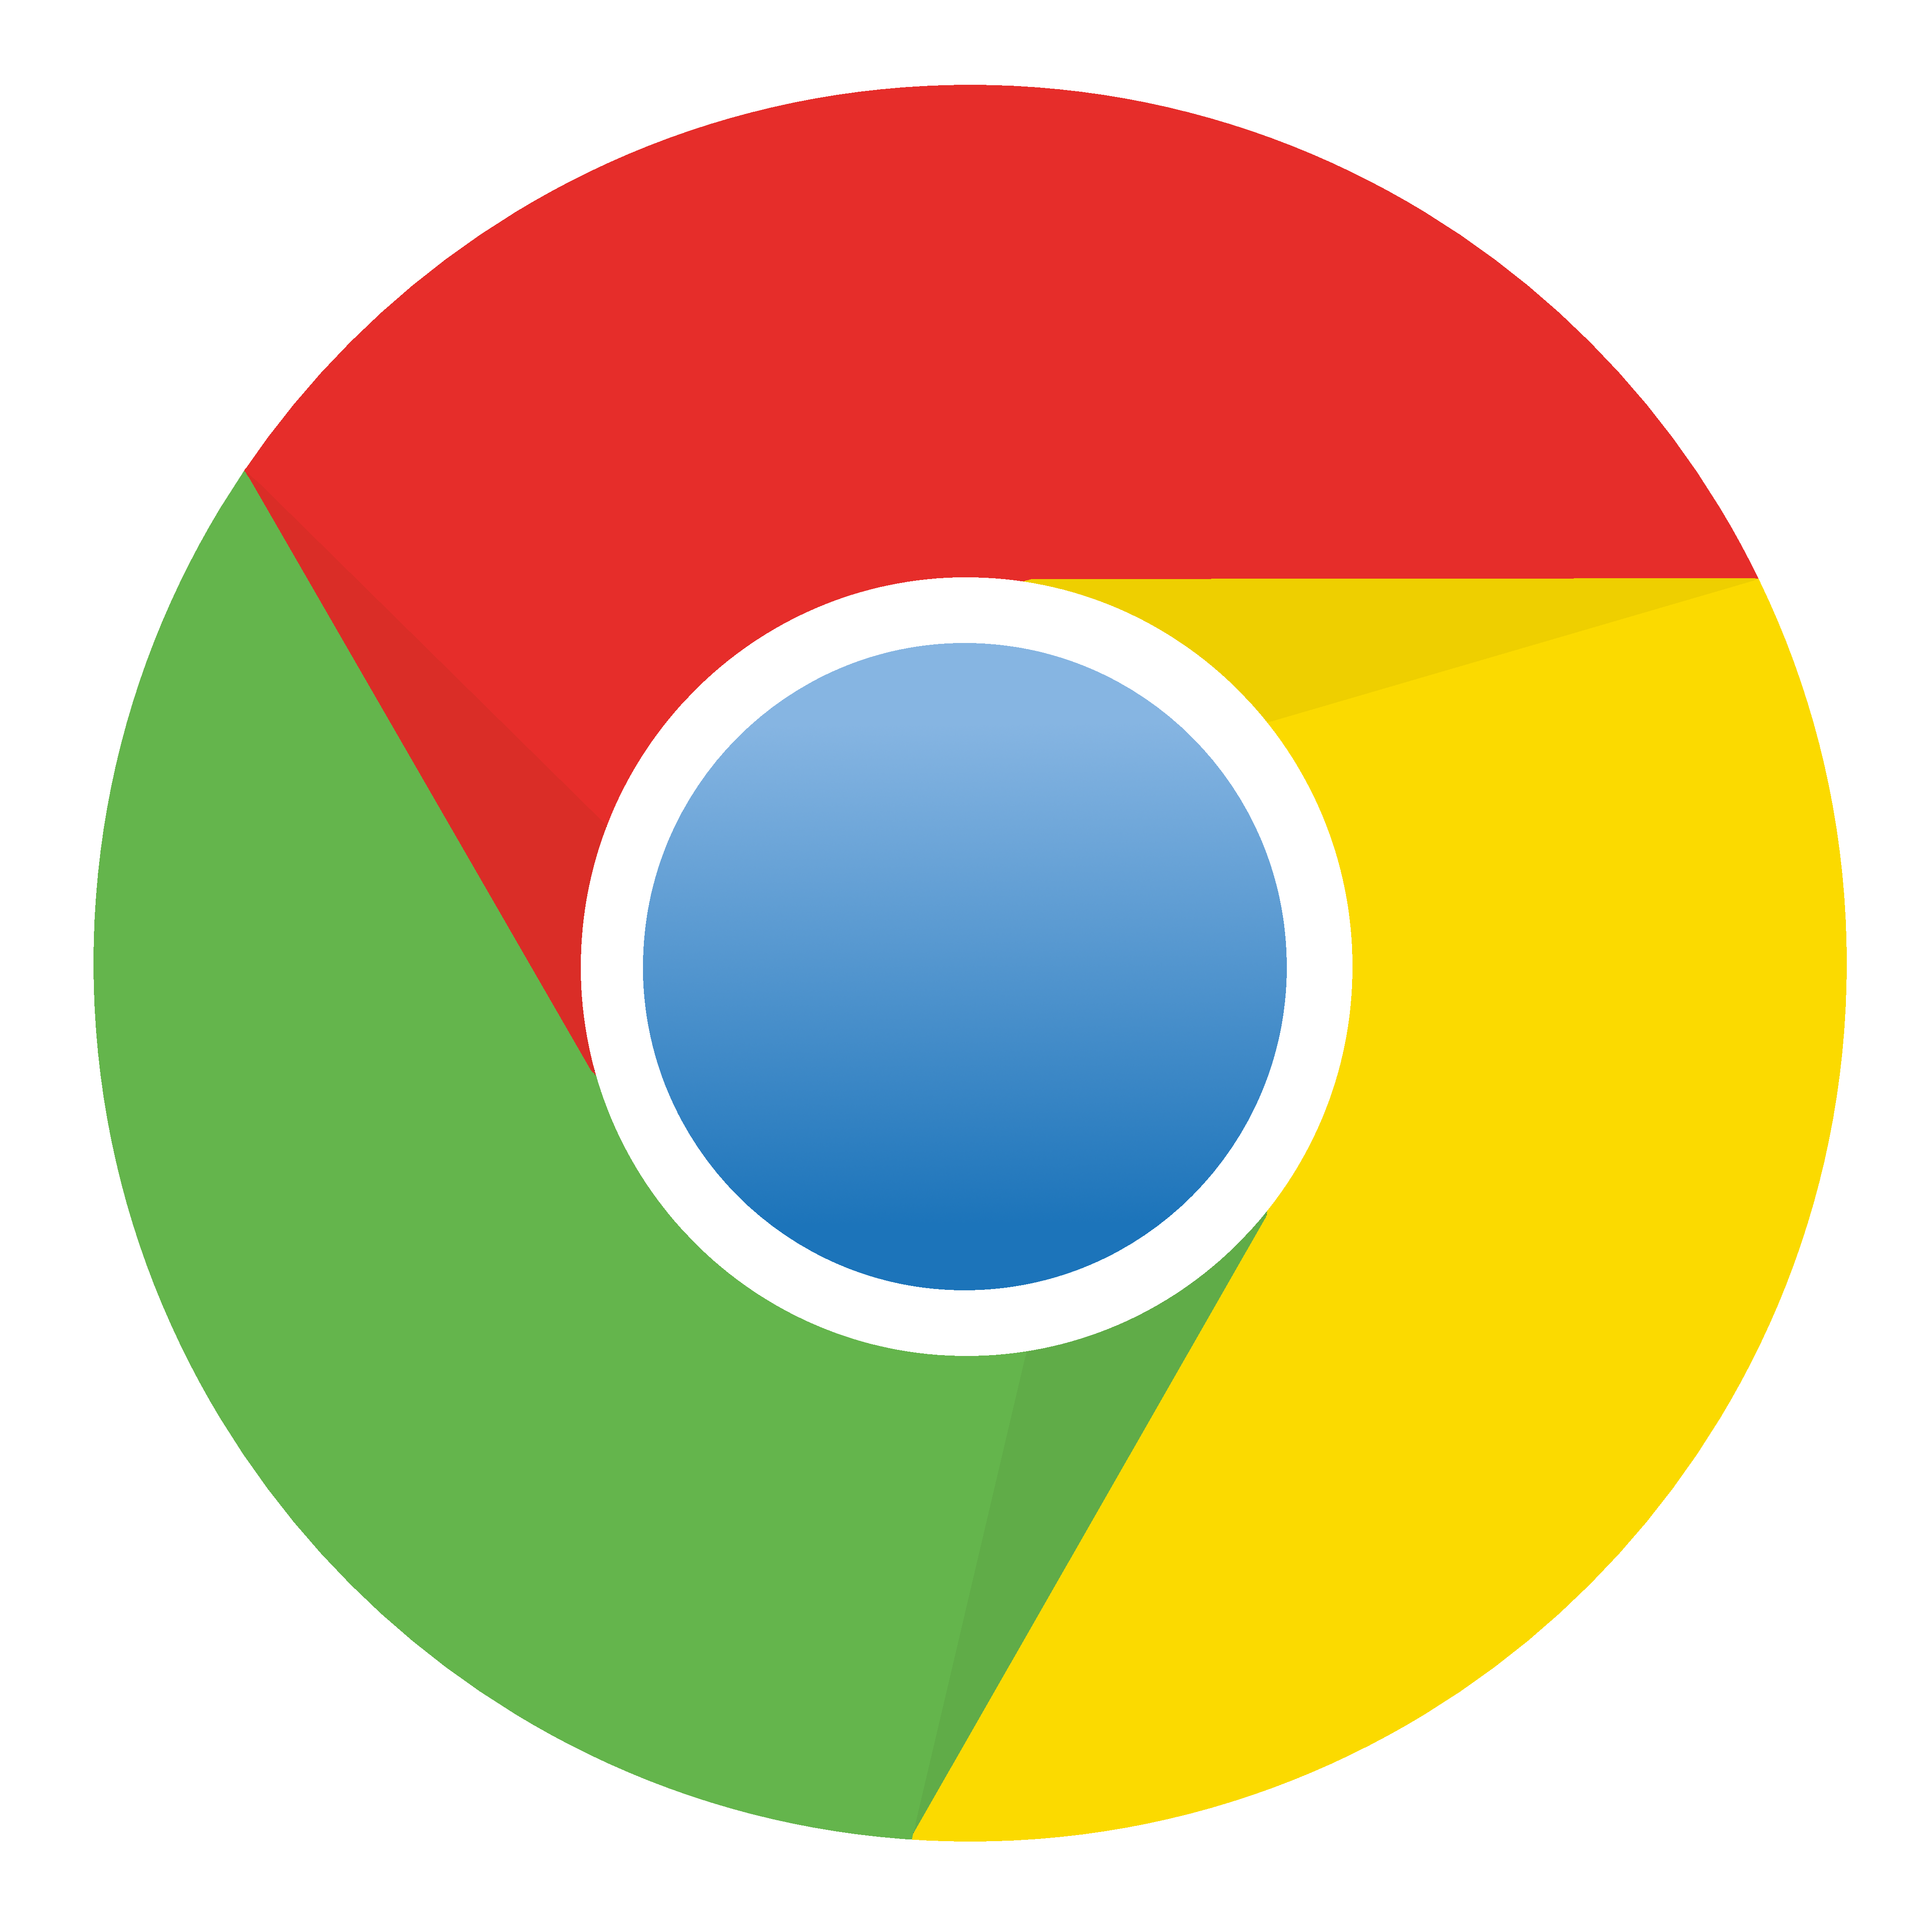 Google Chrome Logo Vector PNG - 104259